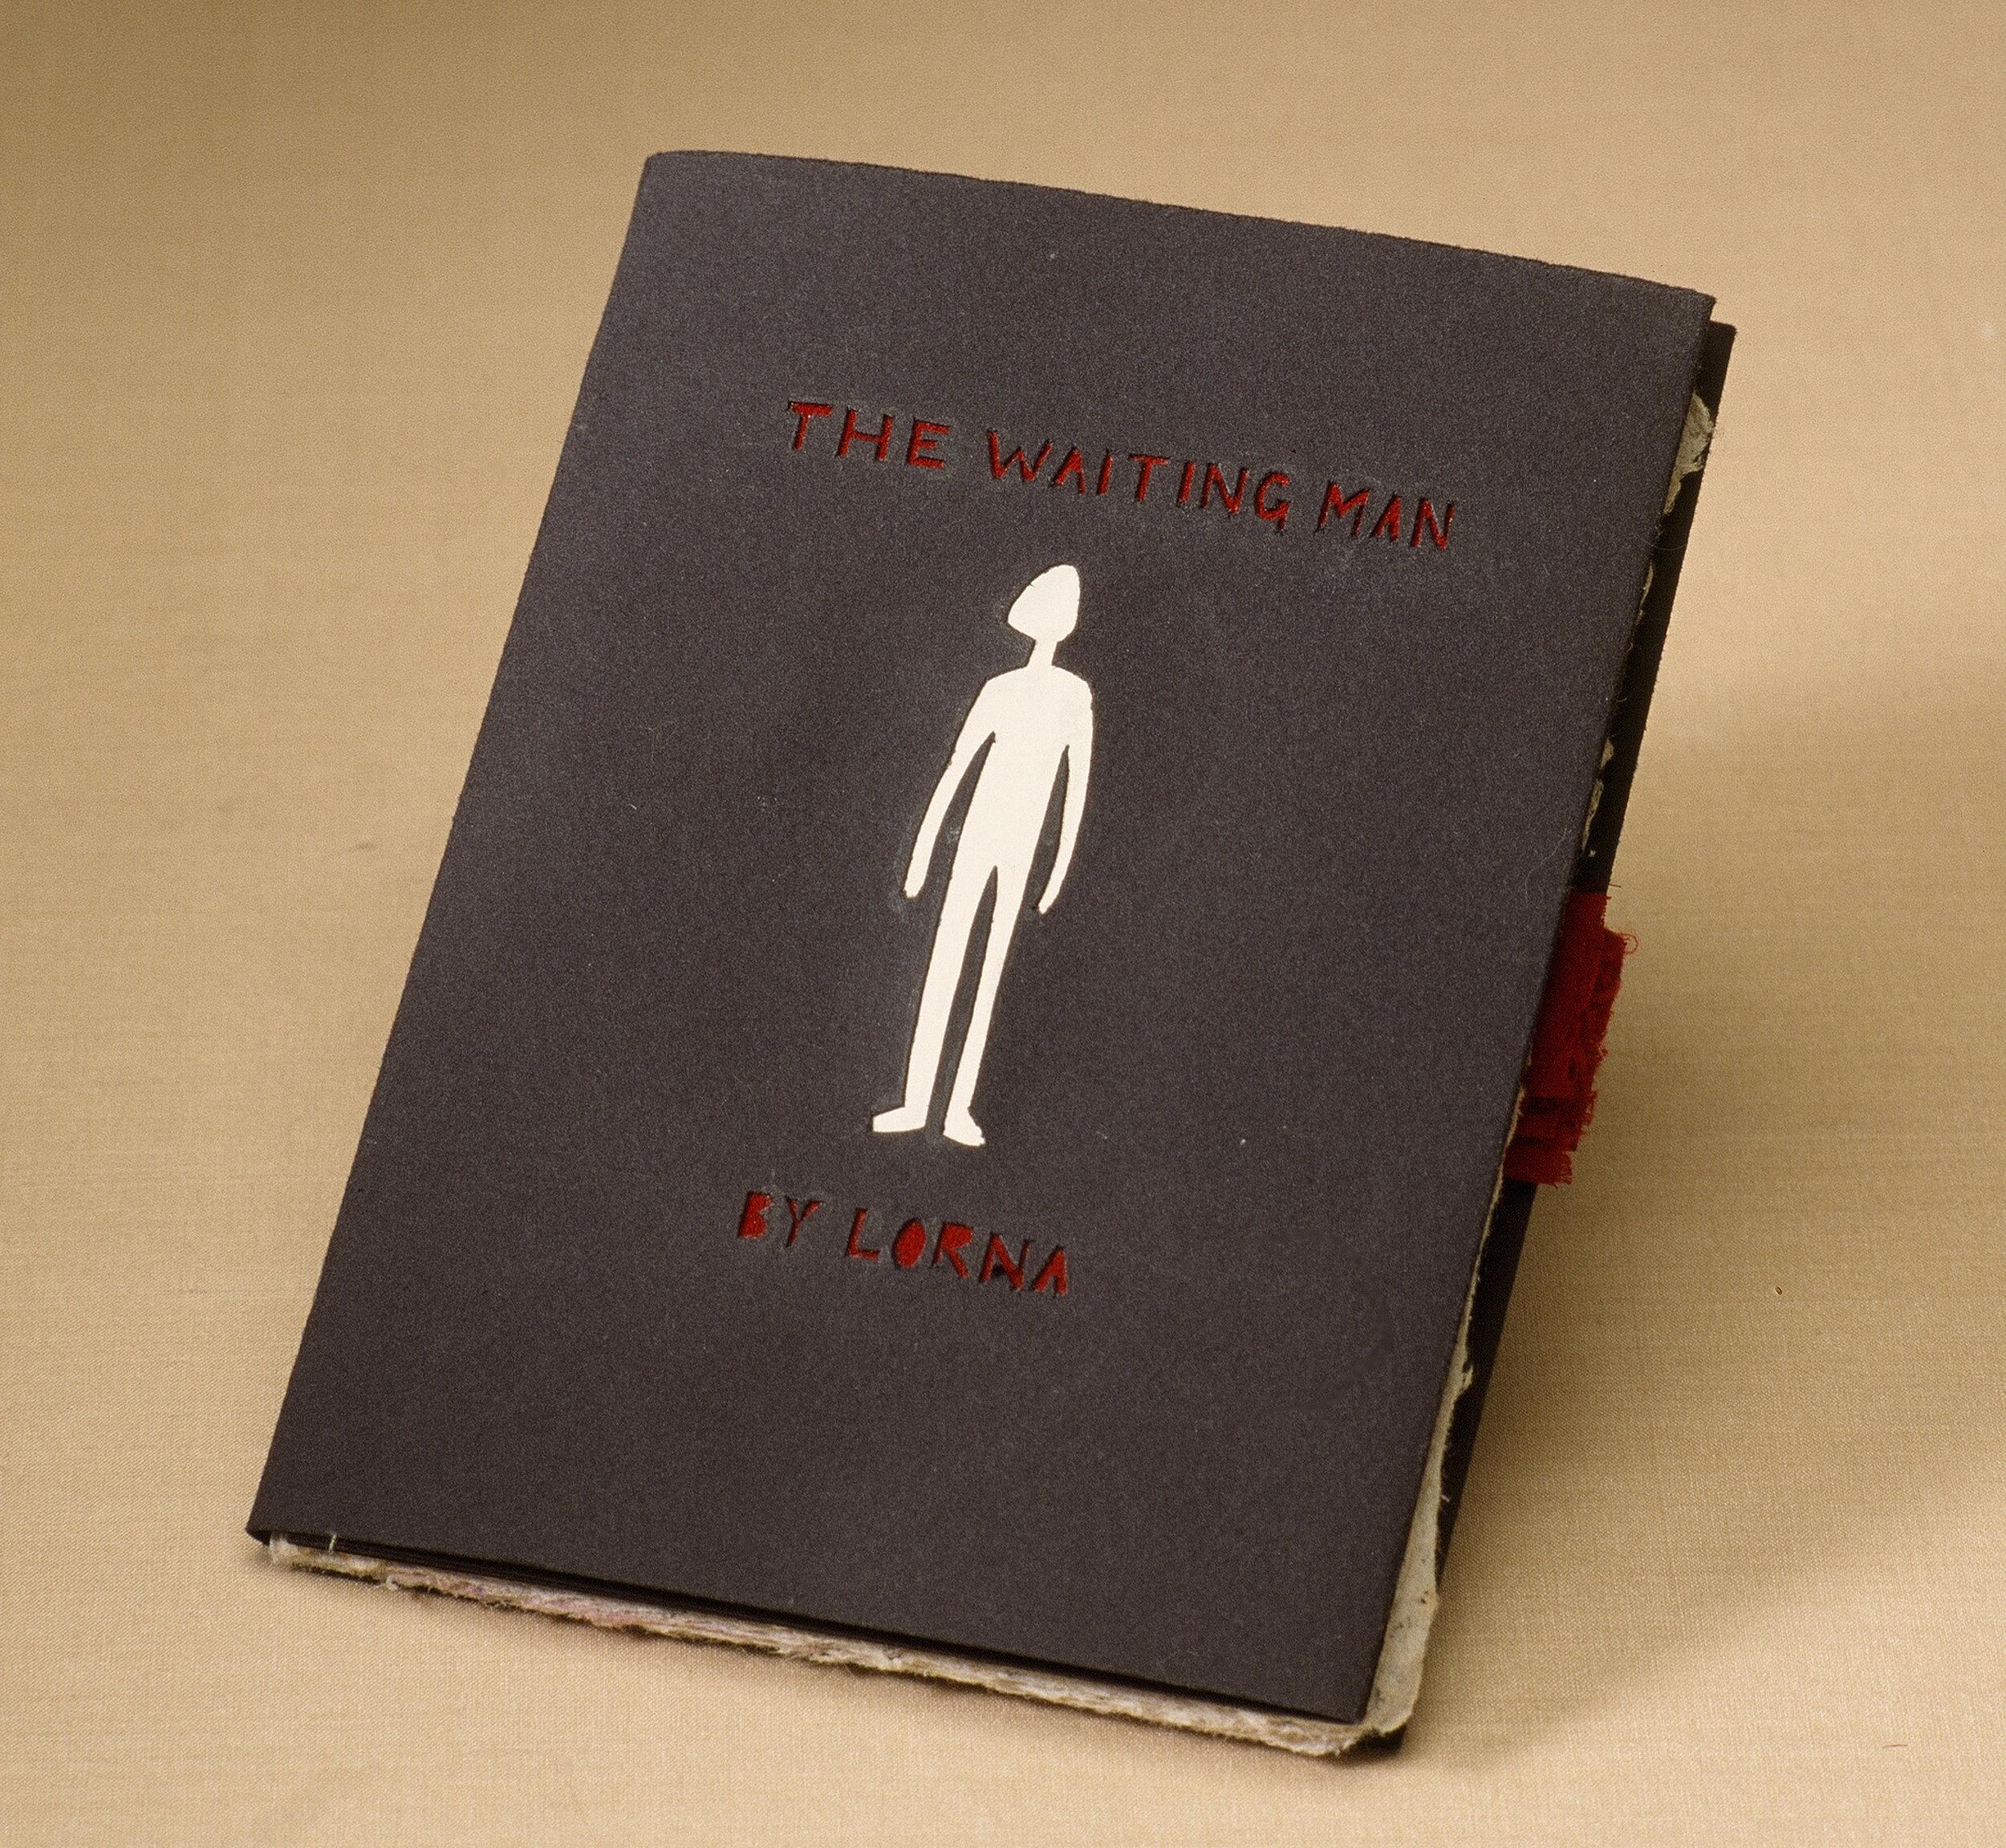 the waiting man_cover_crop.jpg